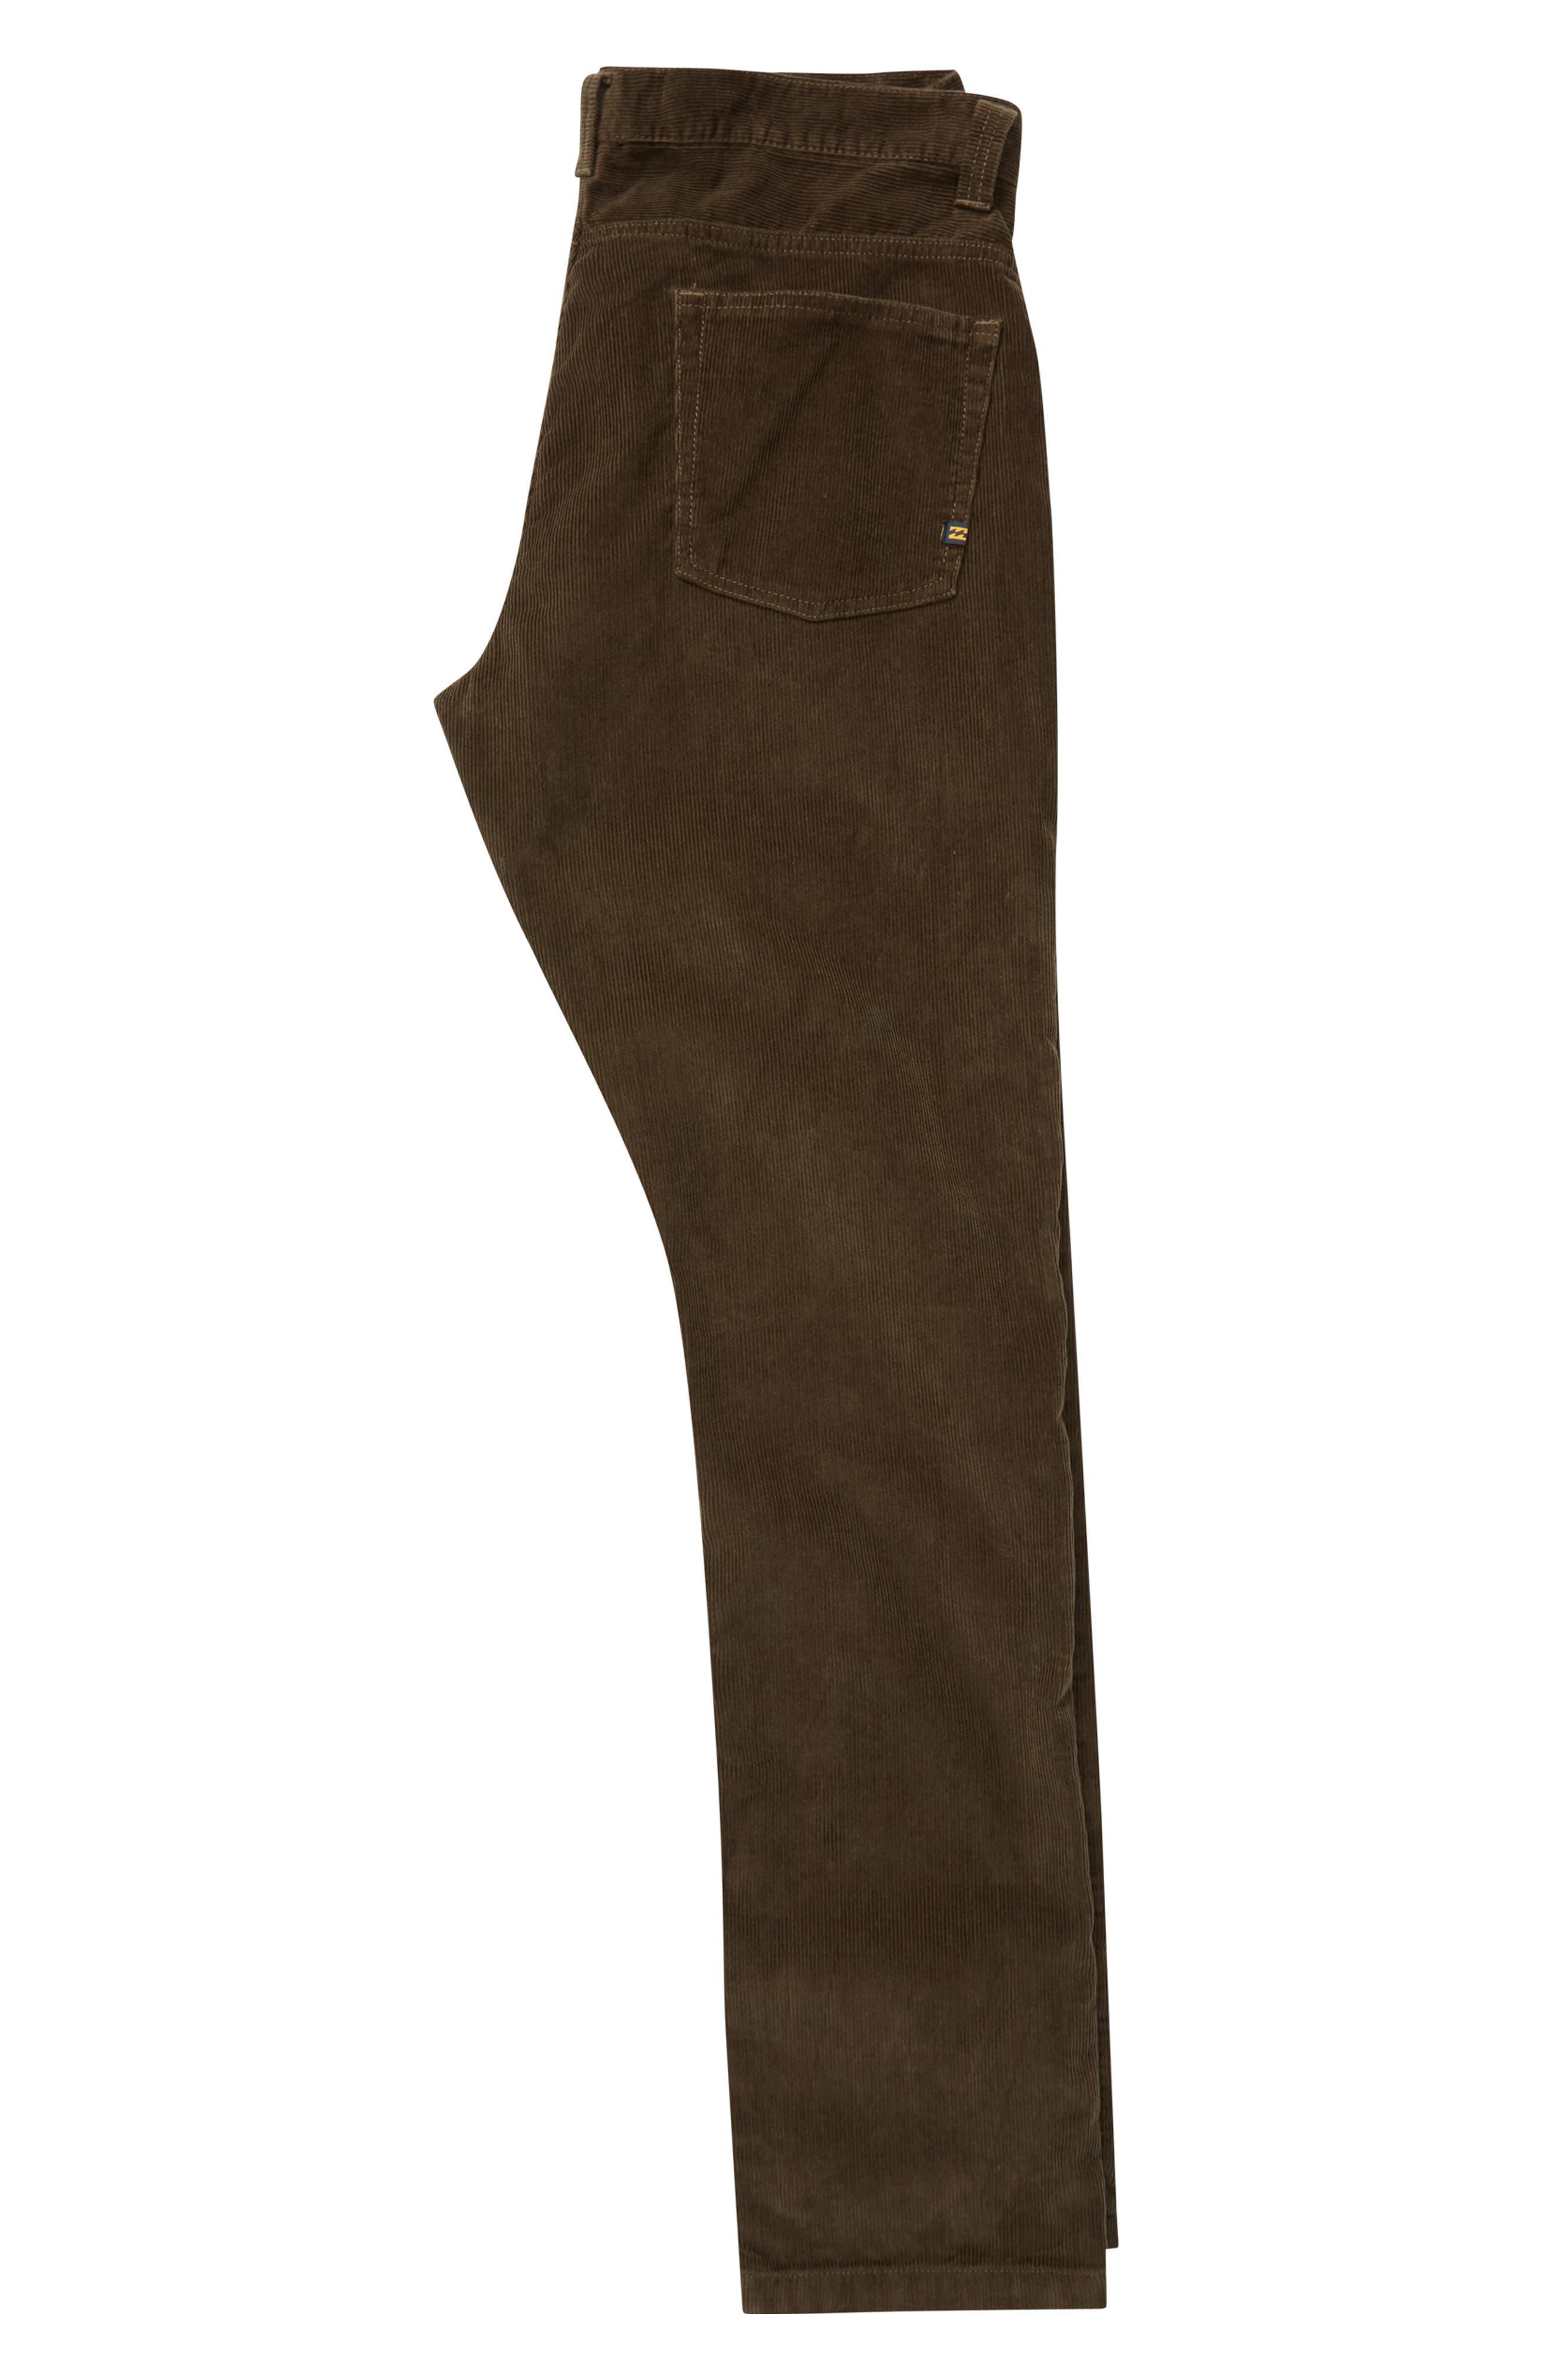 Outsider Corduroy Pants,                             Alternate thumbnail 2, color,                             COFFEE